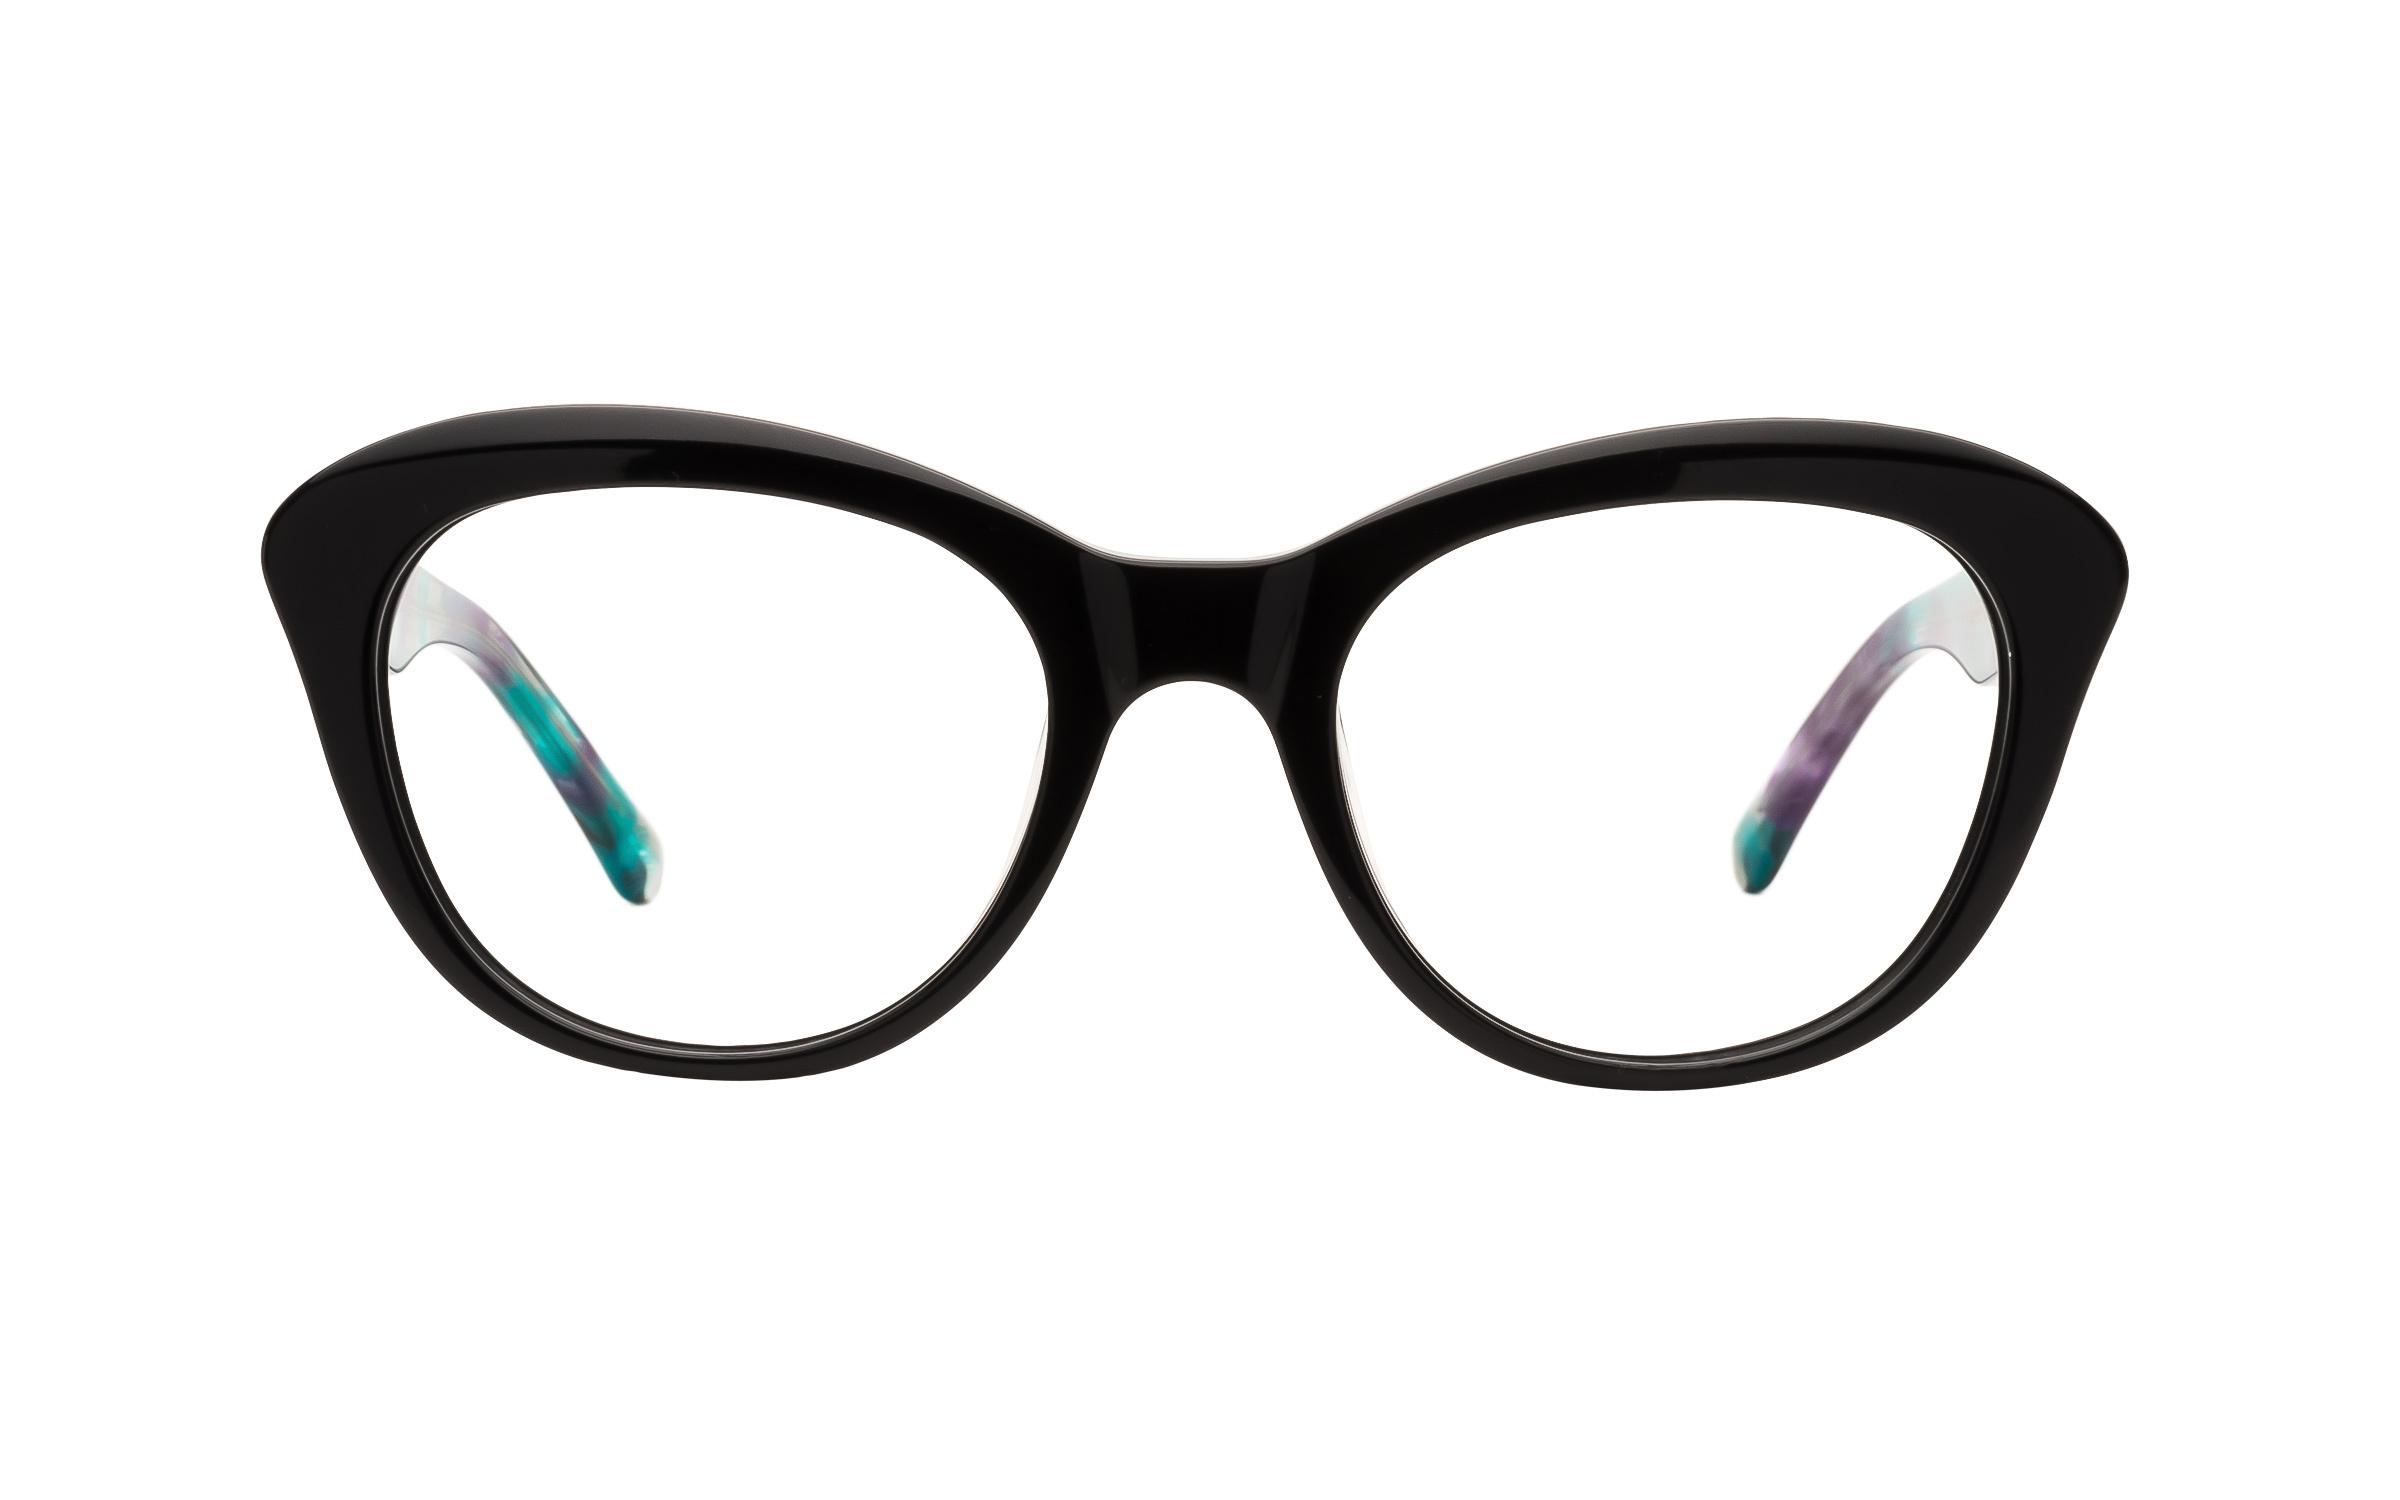 Kam_Dhillon_Womens_Glasses_CatEye_BlackBluePurple_Online_Coastal